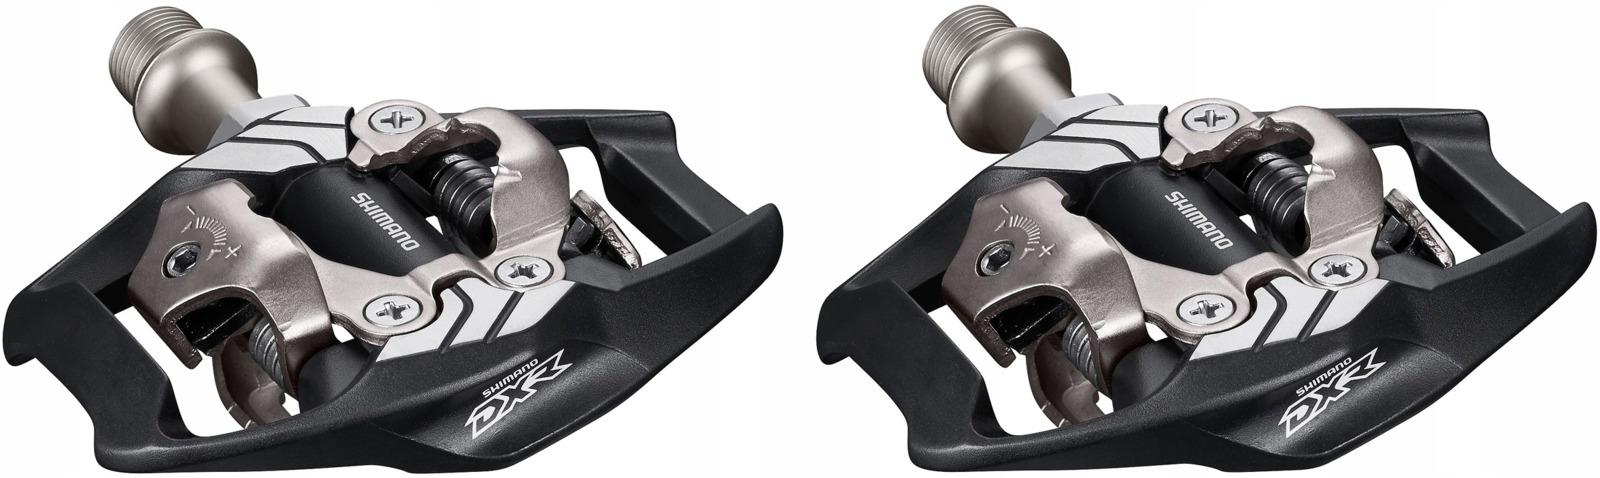 Педали Shimano DXR, MX70, SPD, с шипами SH51, EPDMX70